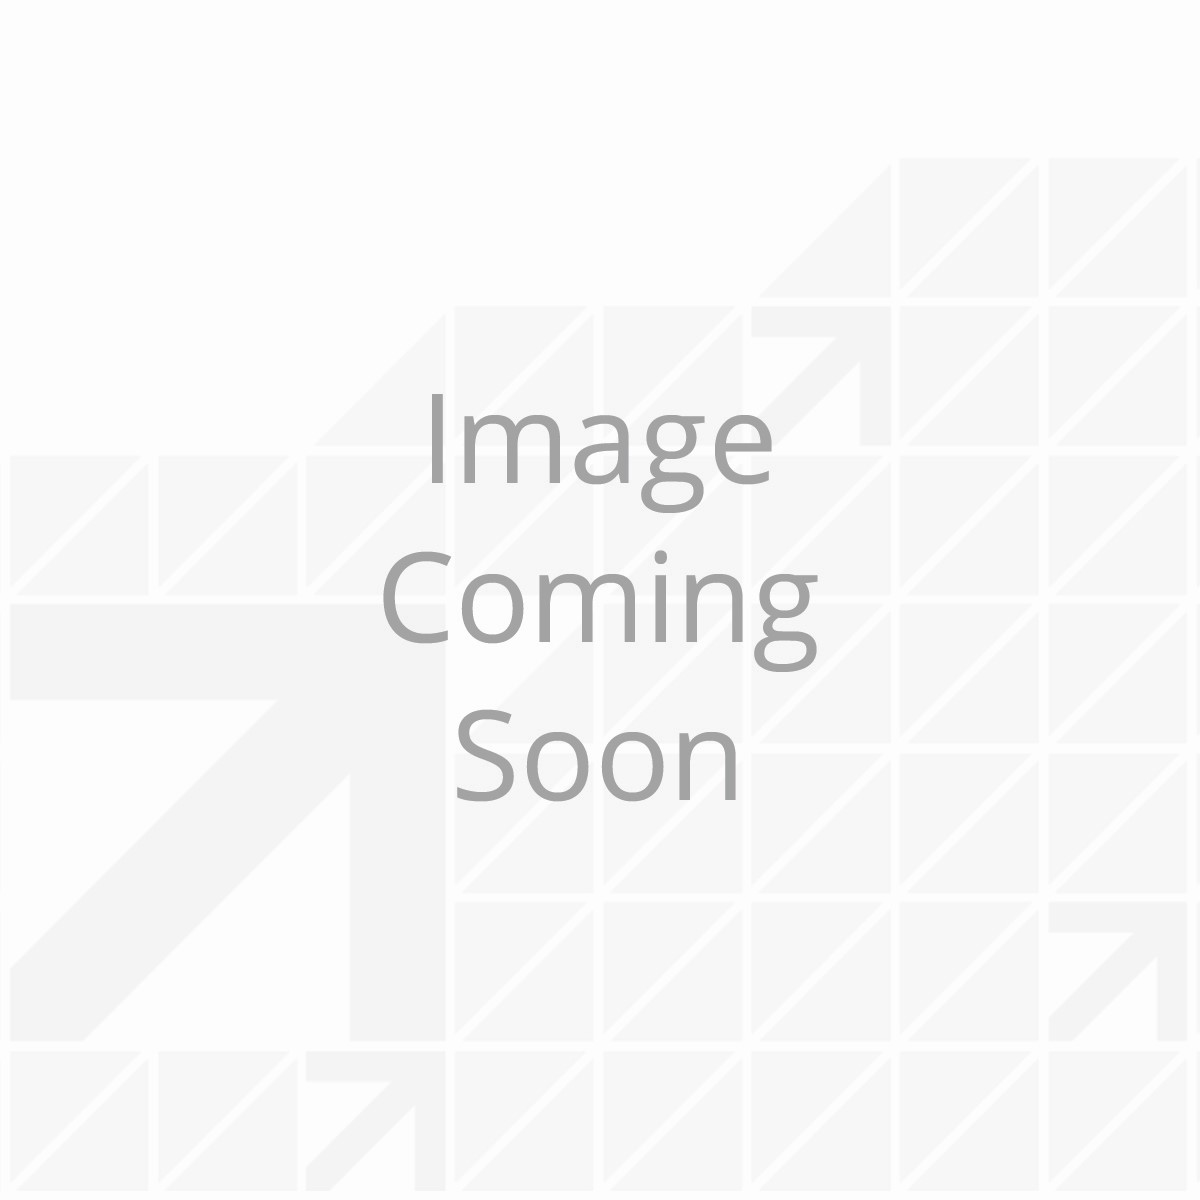 "Teddy Bear Bunk Mat Cover - 32"" x 74"" x 4"" (Tan)"